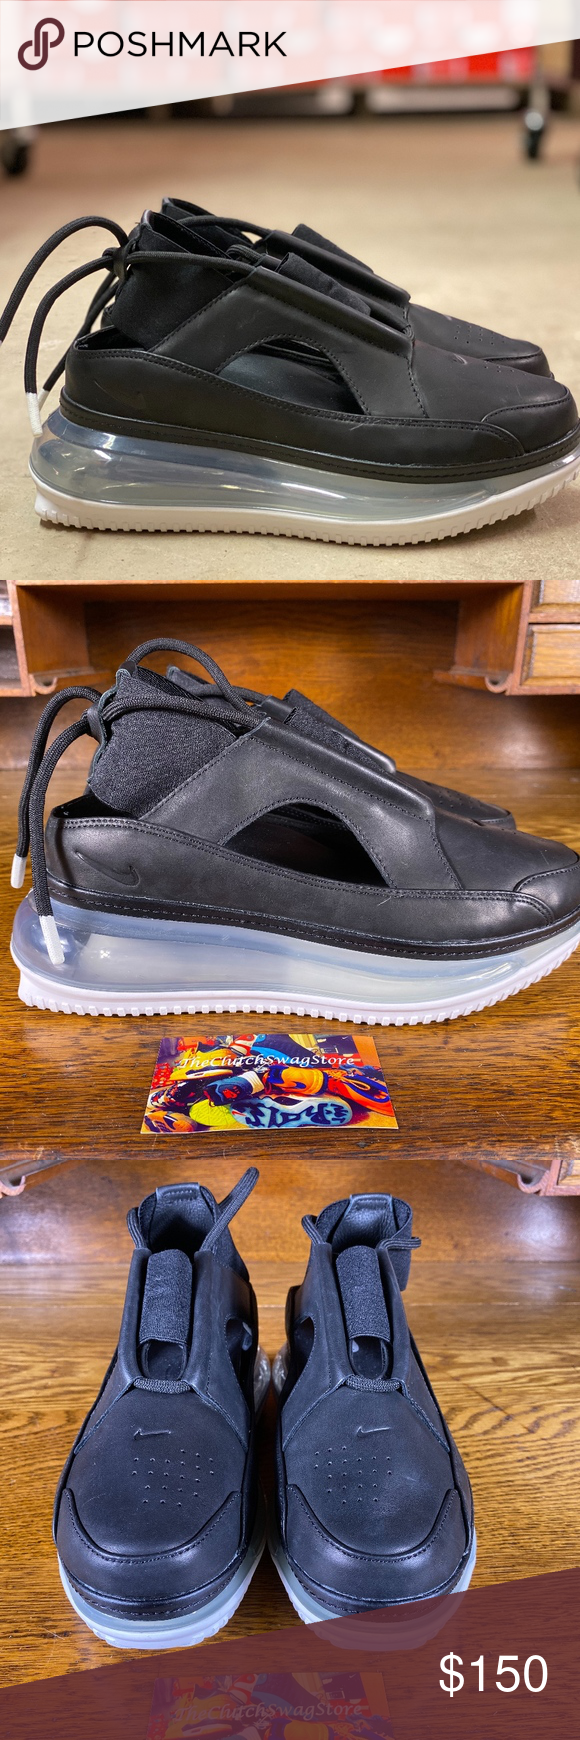 Nike Air Max Ff 720 Womens Sandal Shoes Size 7 5 Item Nike Air Max Ff 720 Black Clear Ao3189 001 Size Women S Us Womens Sandals Nike Air Max Shoes Sandals